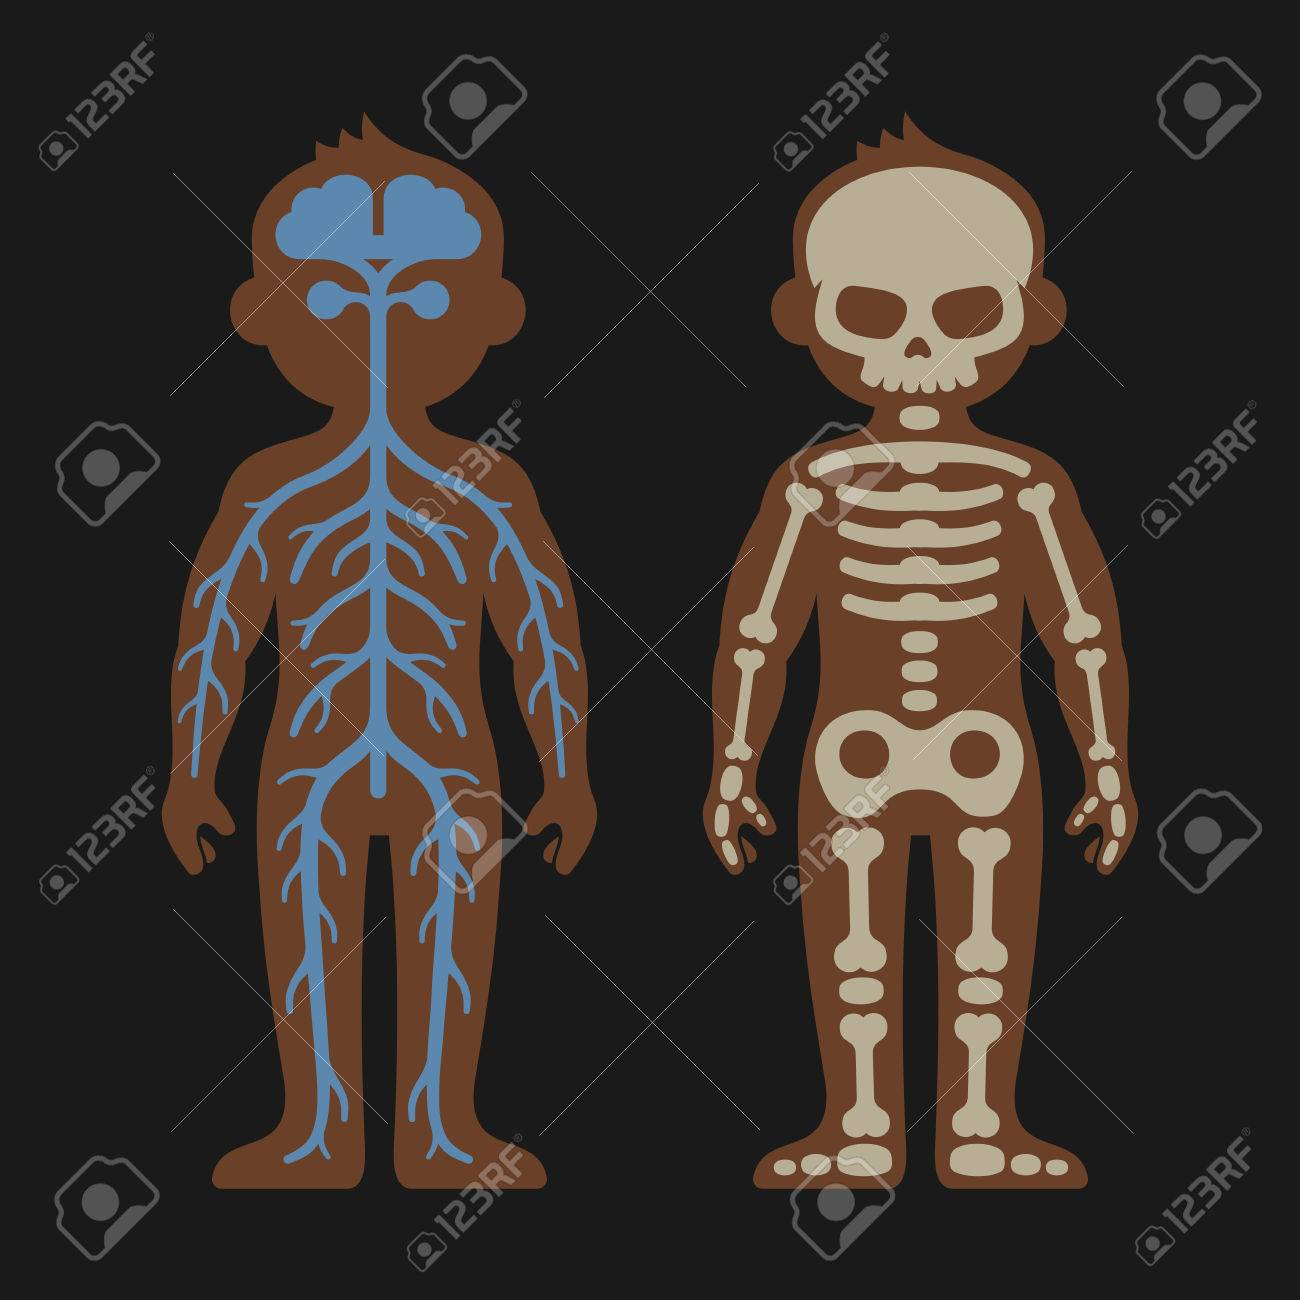 Menschlicher Körper-Anatomie-Set. Skeletonand Nervensystem. Vektor ...